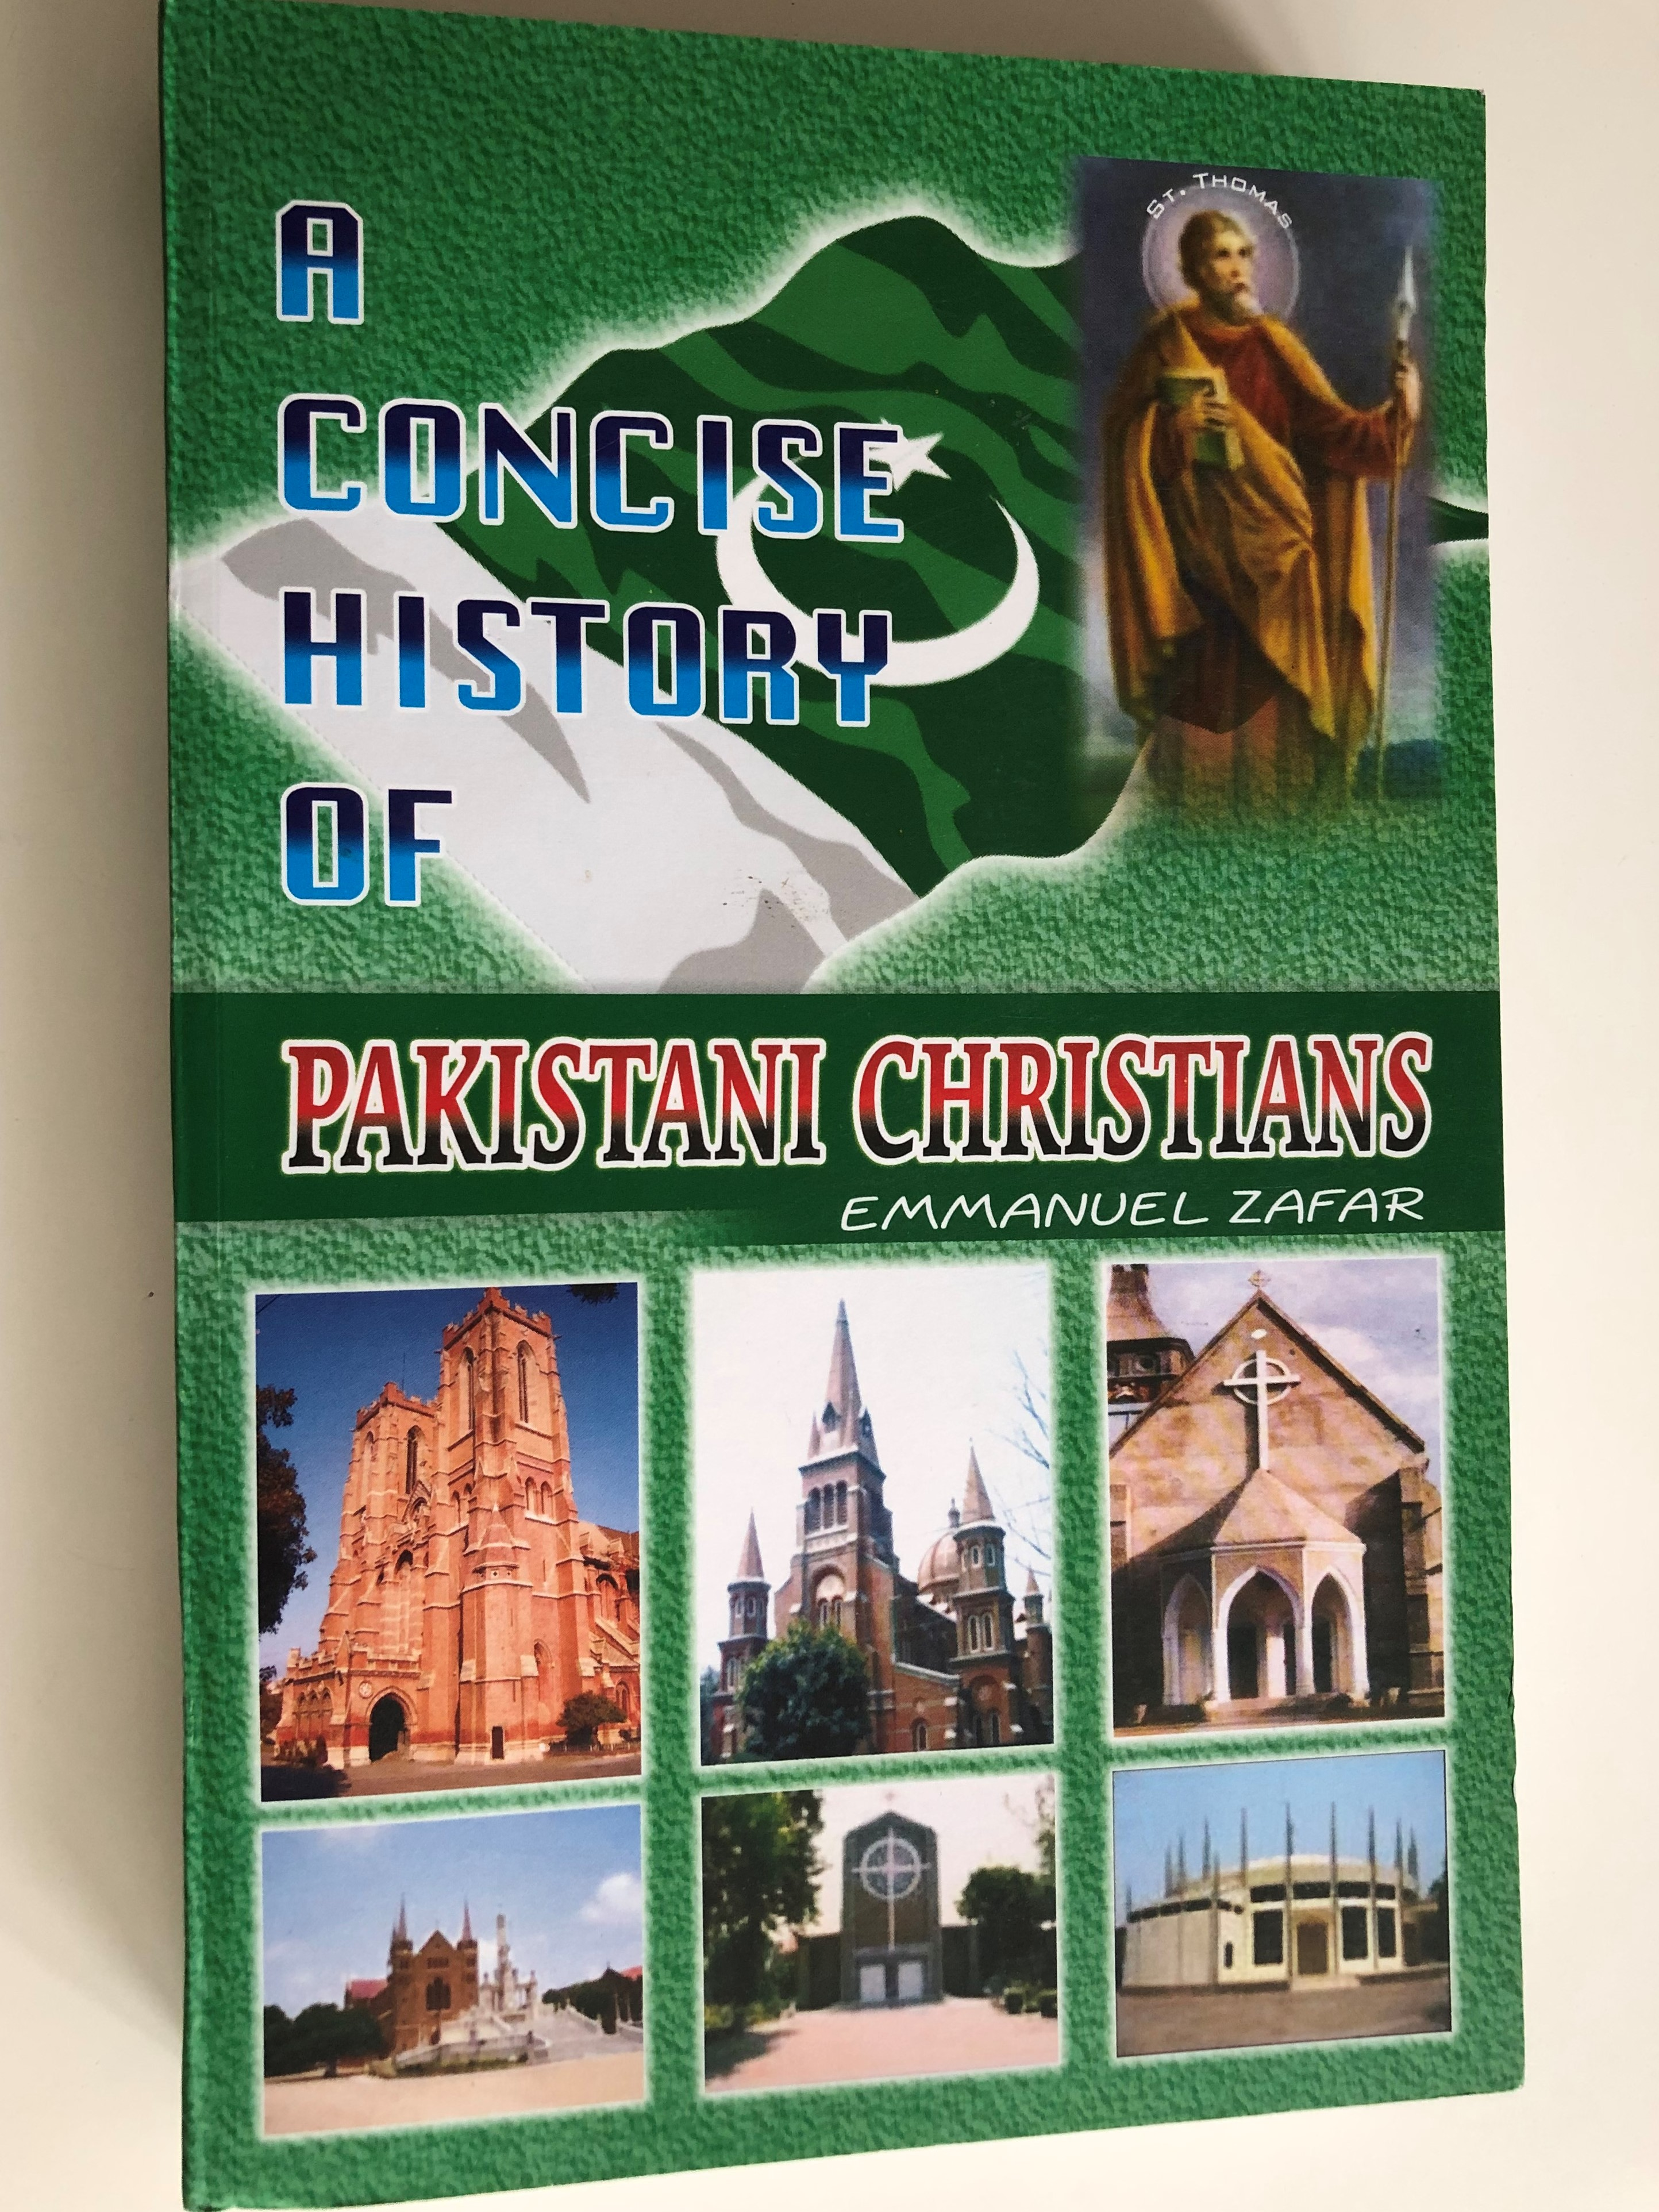 a-concise-history-of-pakistani-christians-by-emmanuel-zafar-humsookhan-publication-paperback-2007-1-.jpg